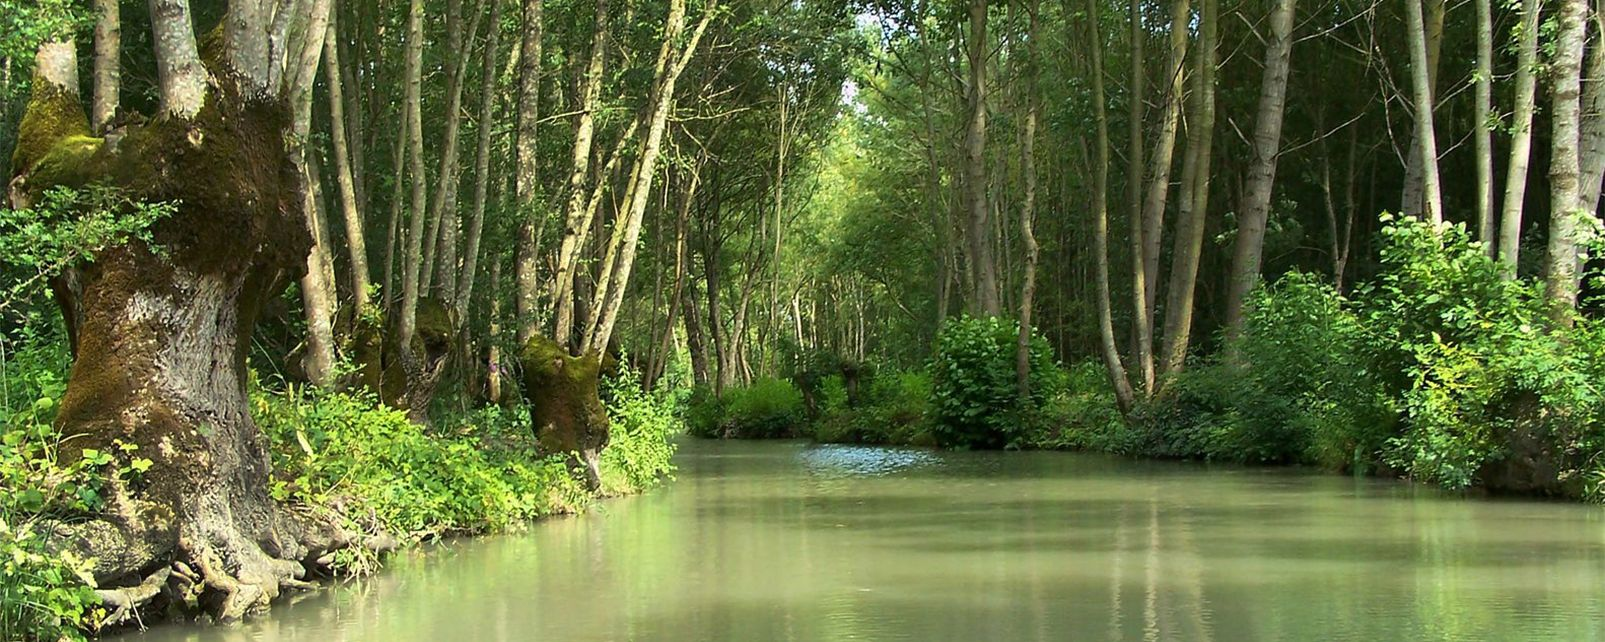 Marais Poitevin National Park , France